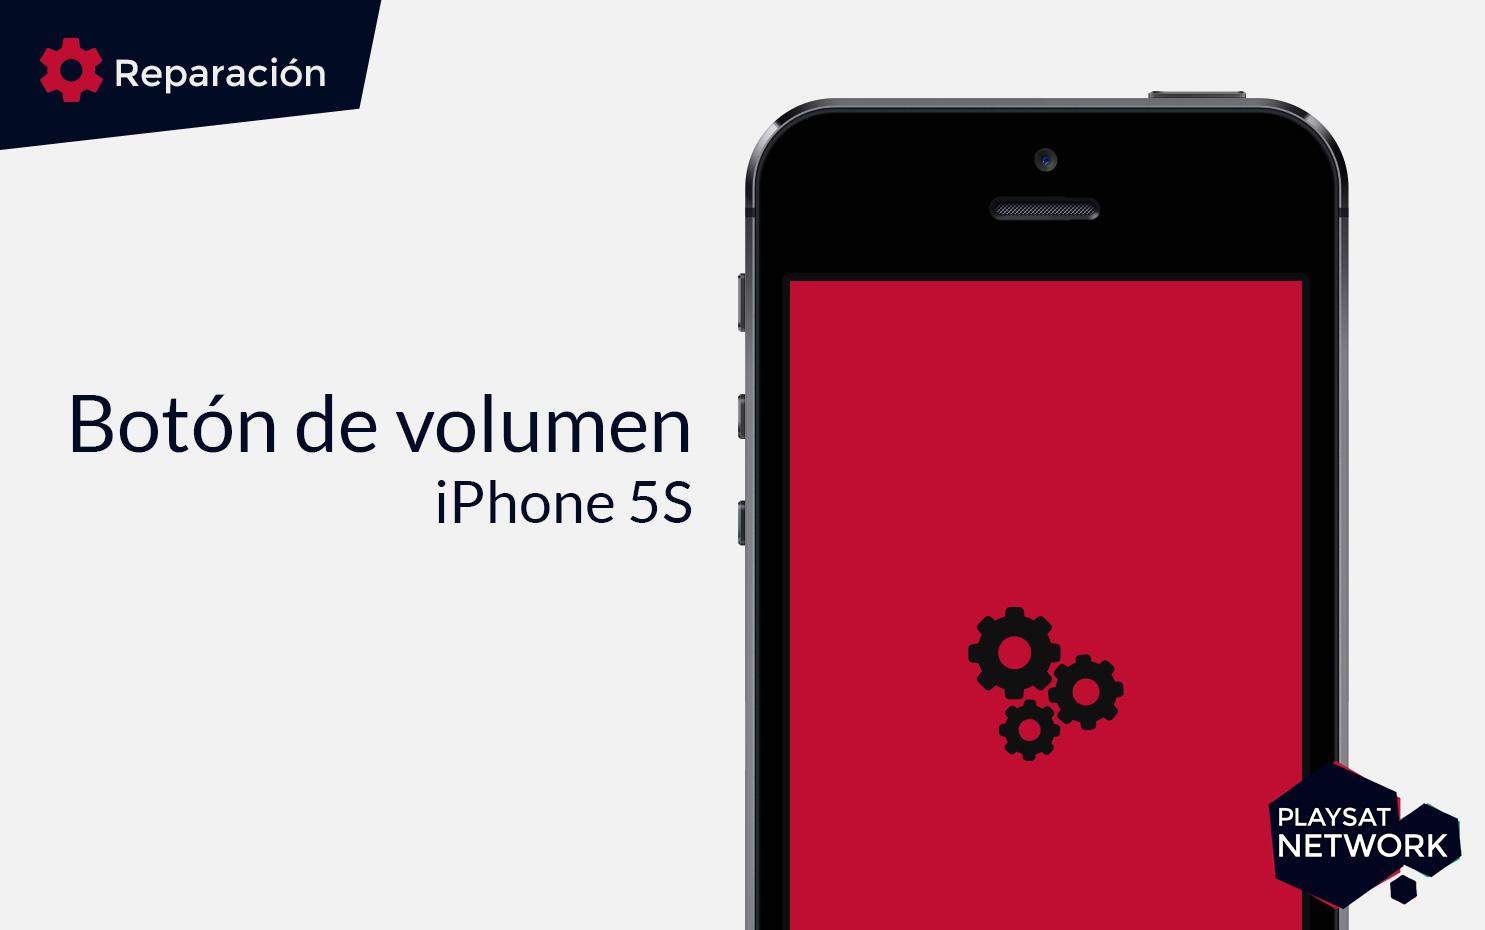 Reparar botón de volumen iPhone 5S